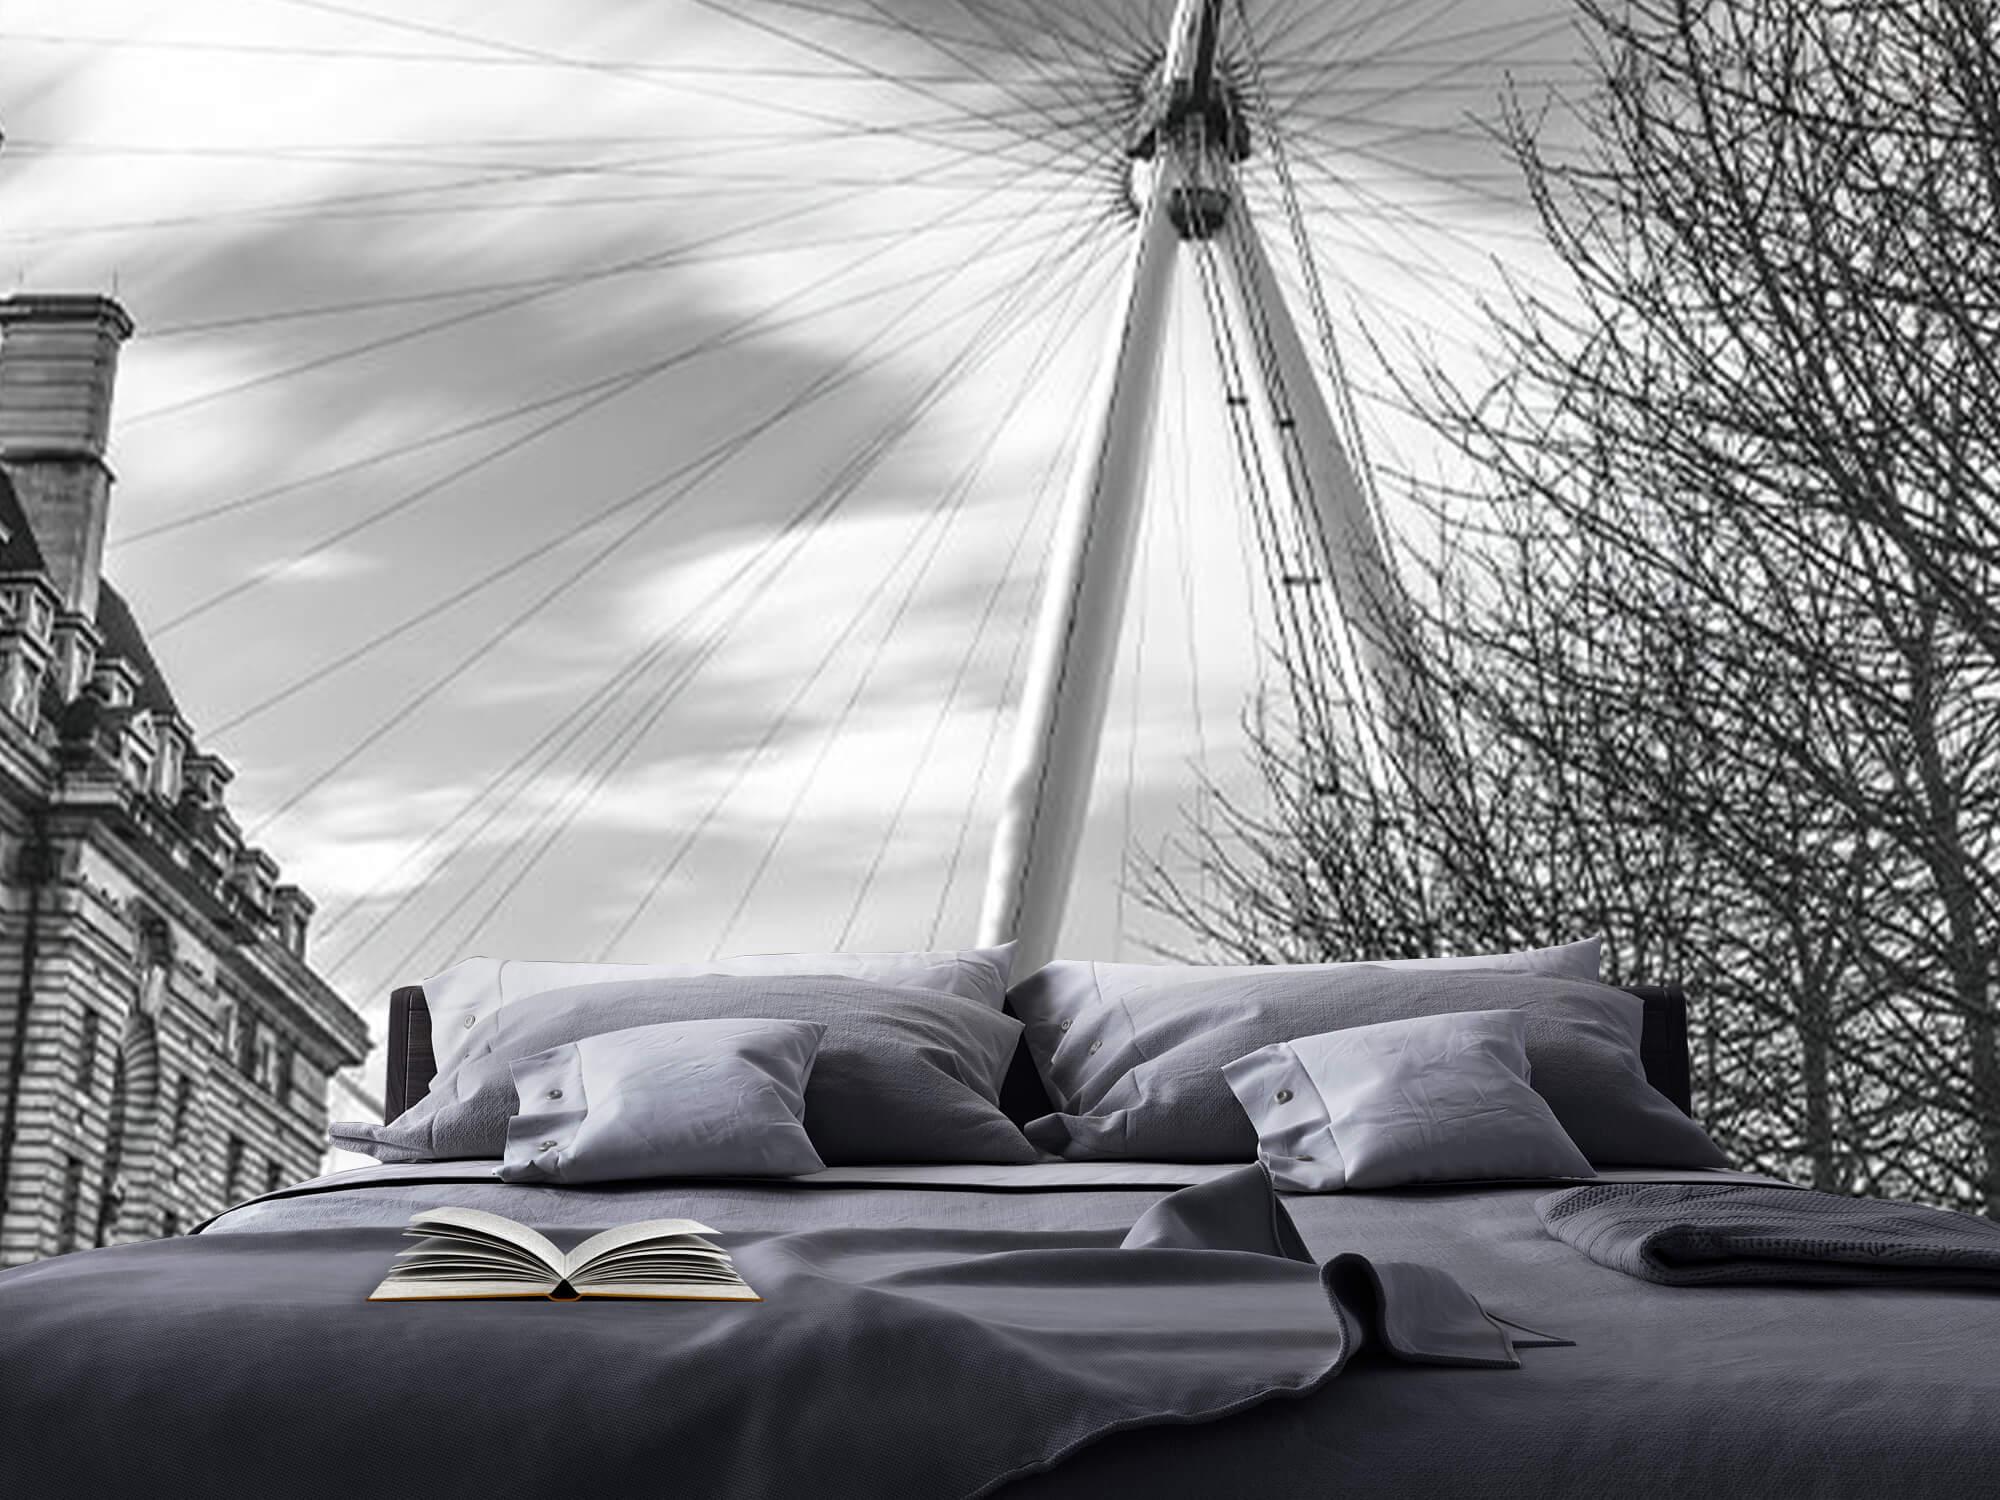 Pariserhjul i London 18